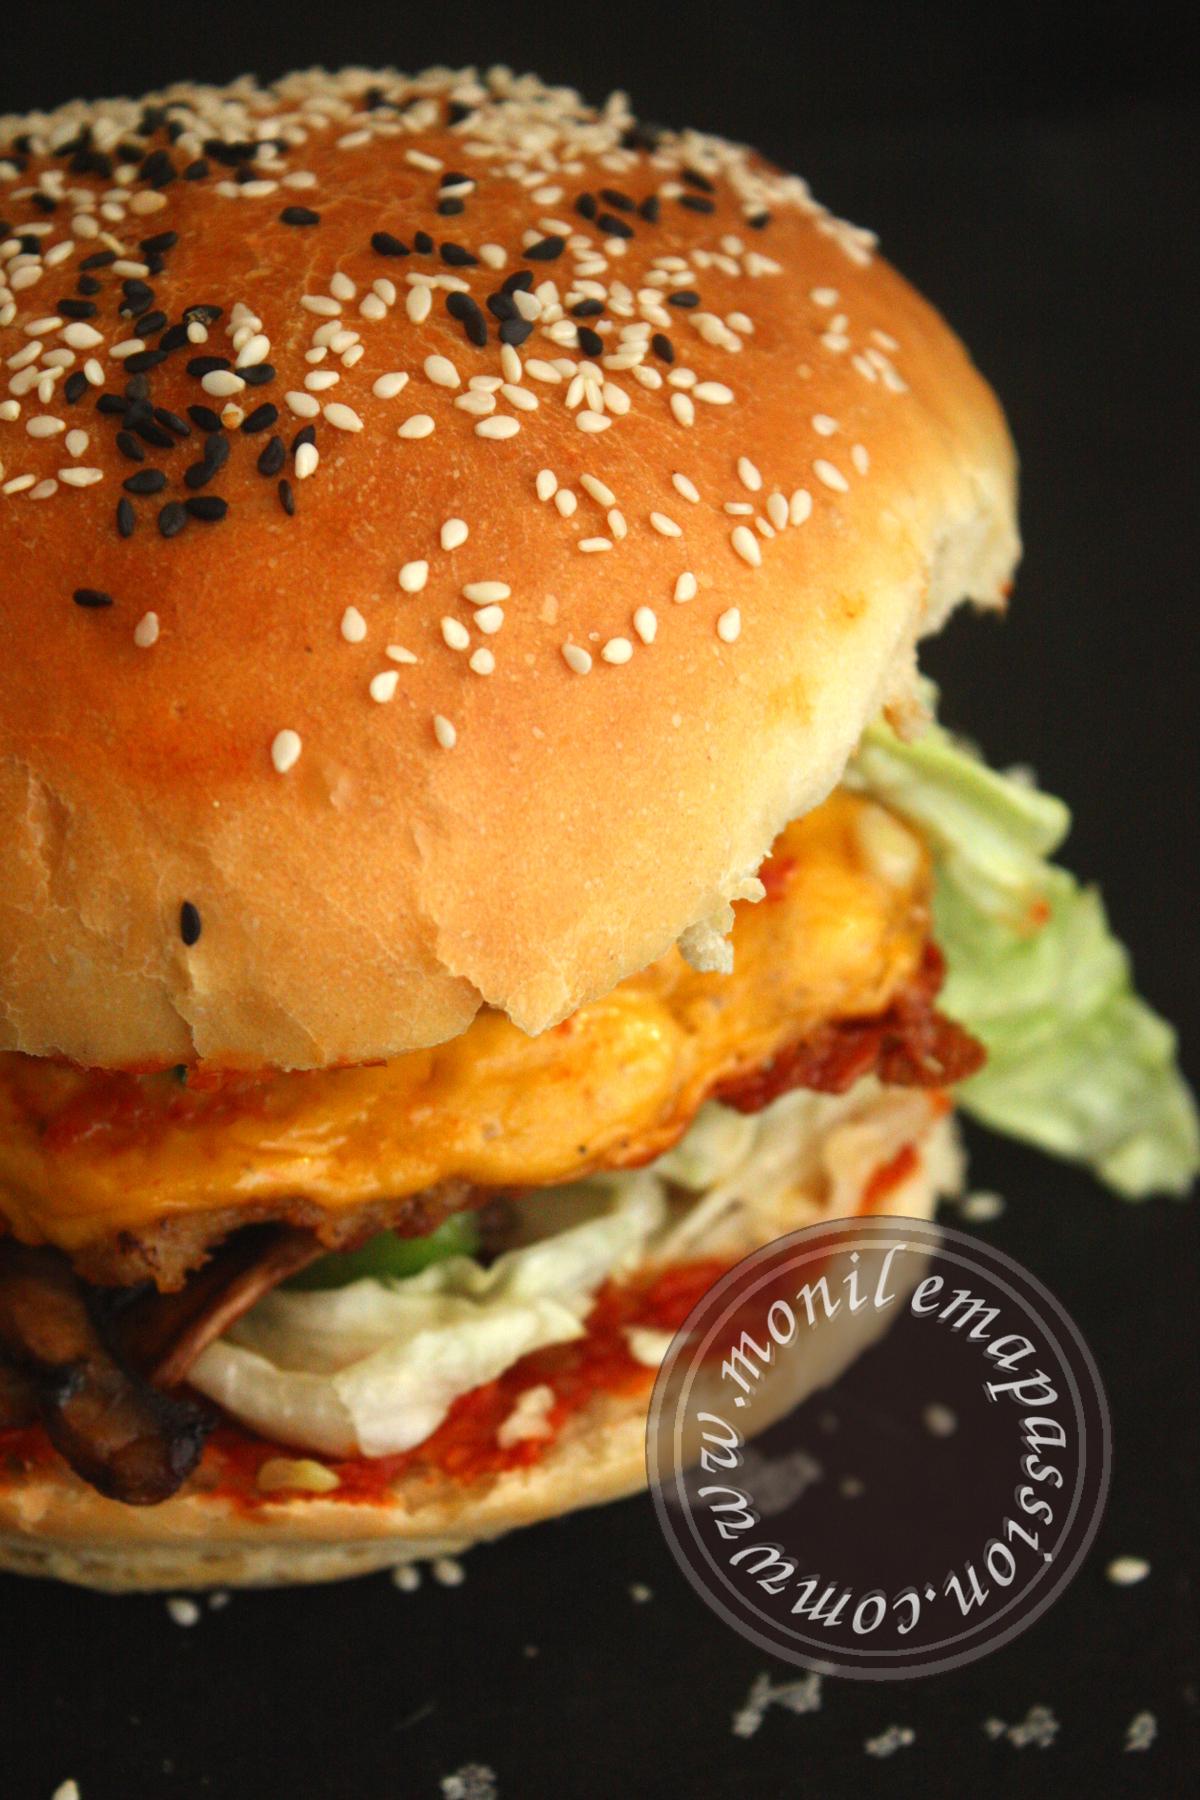 Pains à burger maison - Homemade burger buns